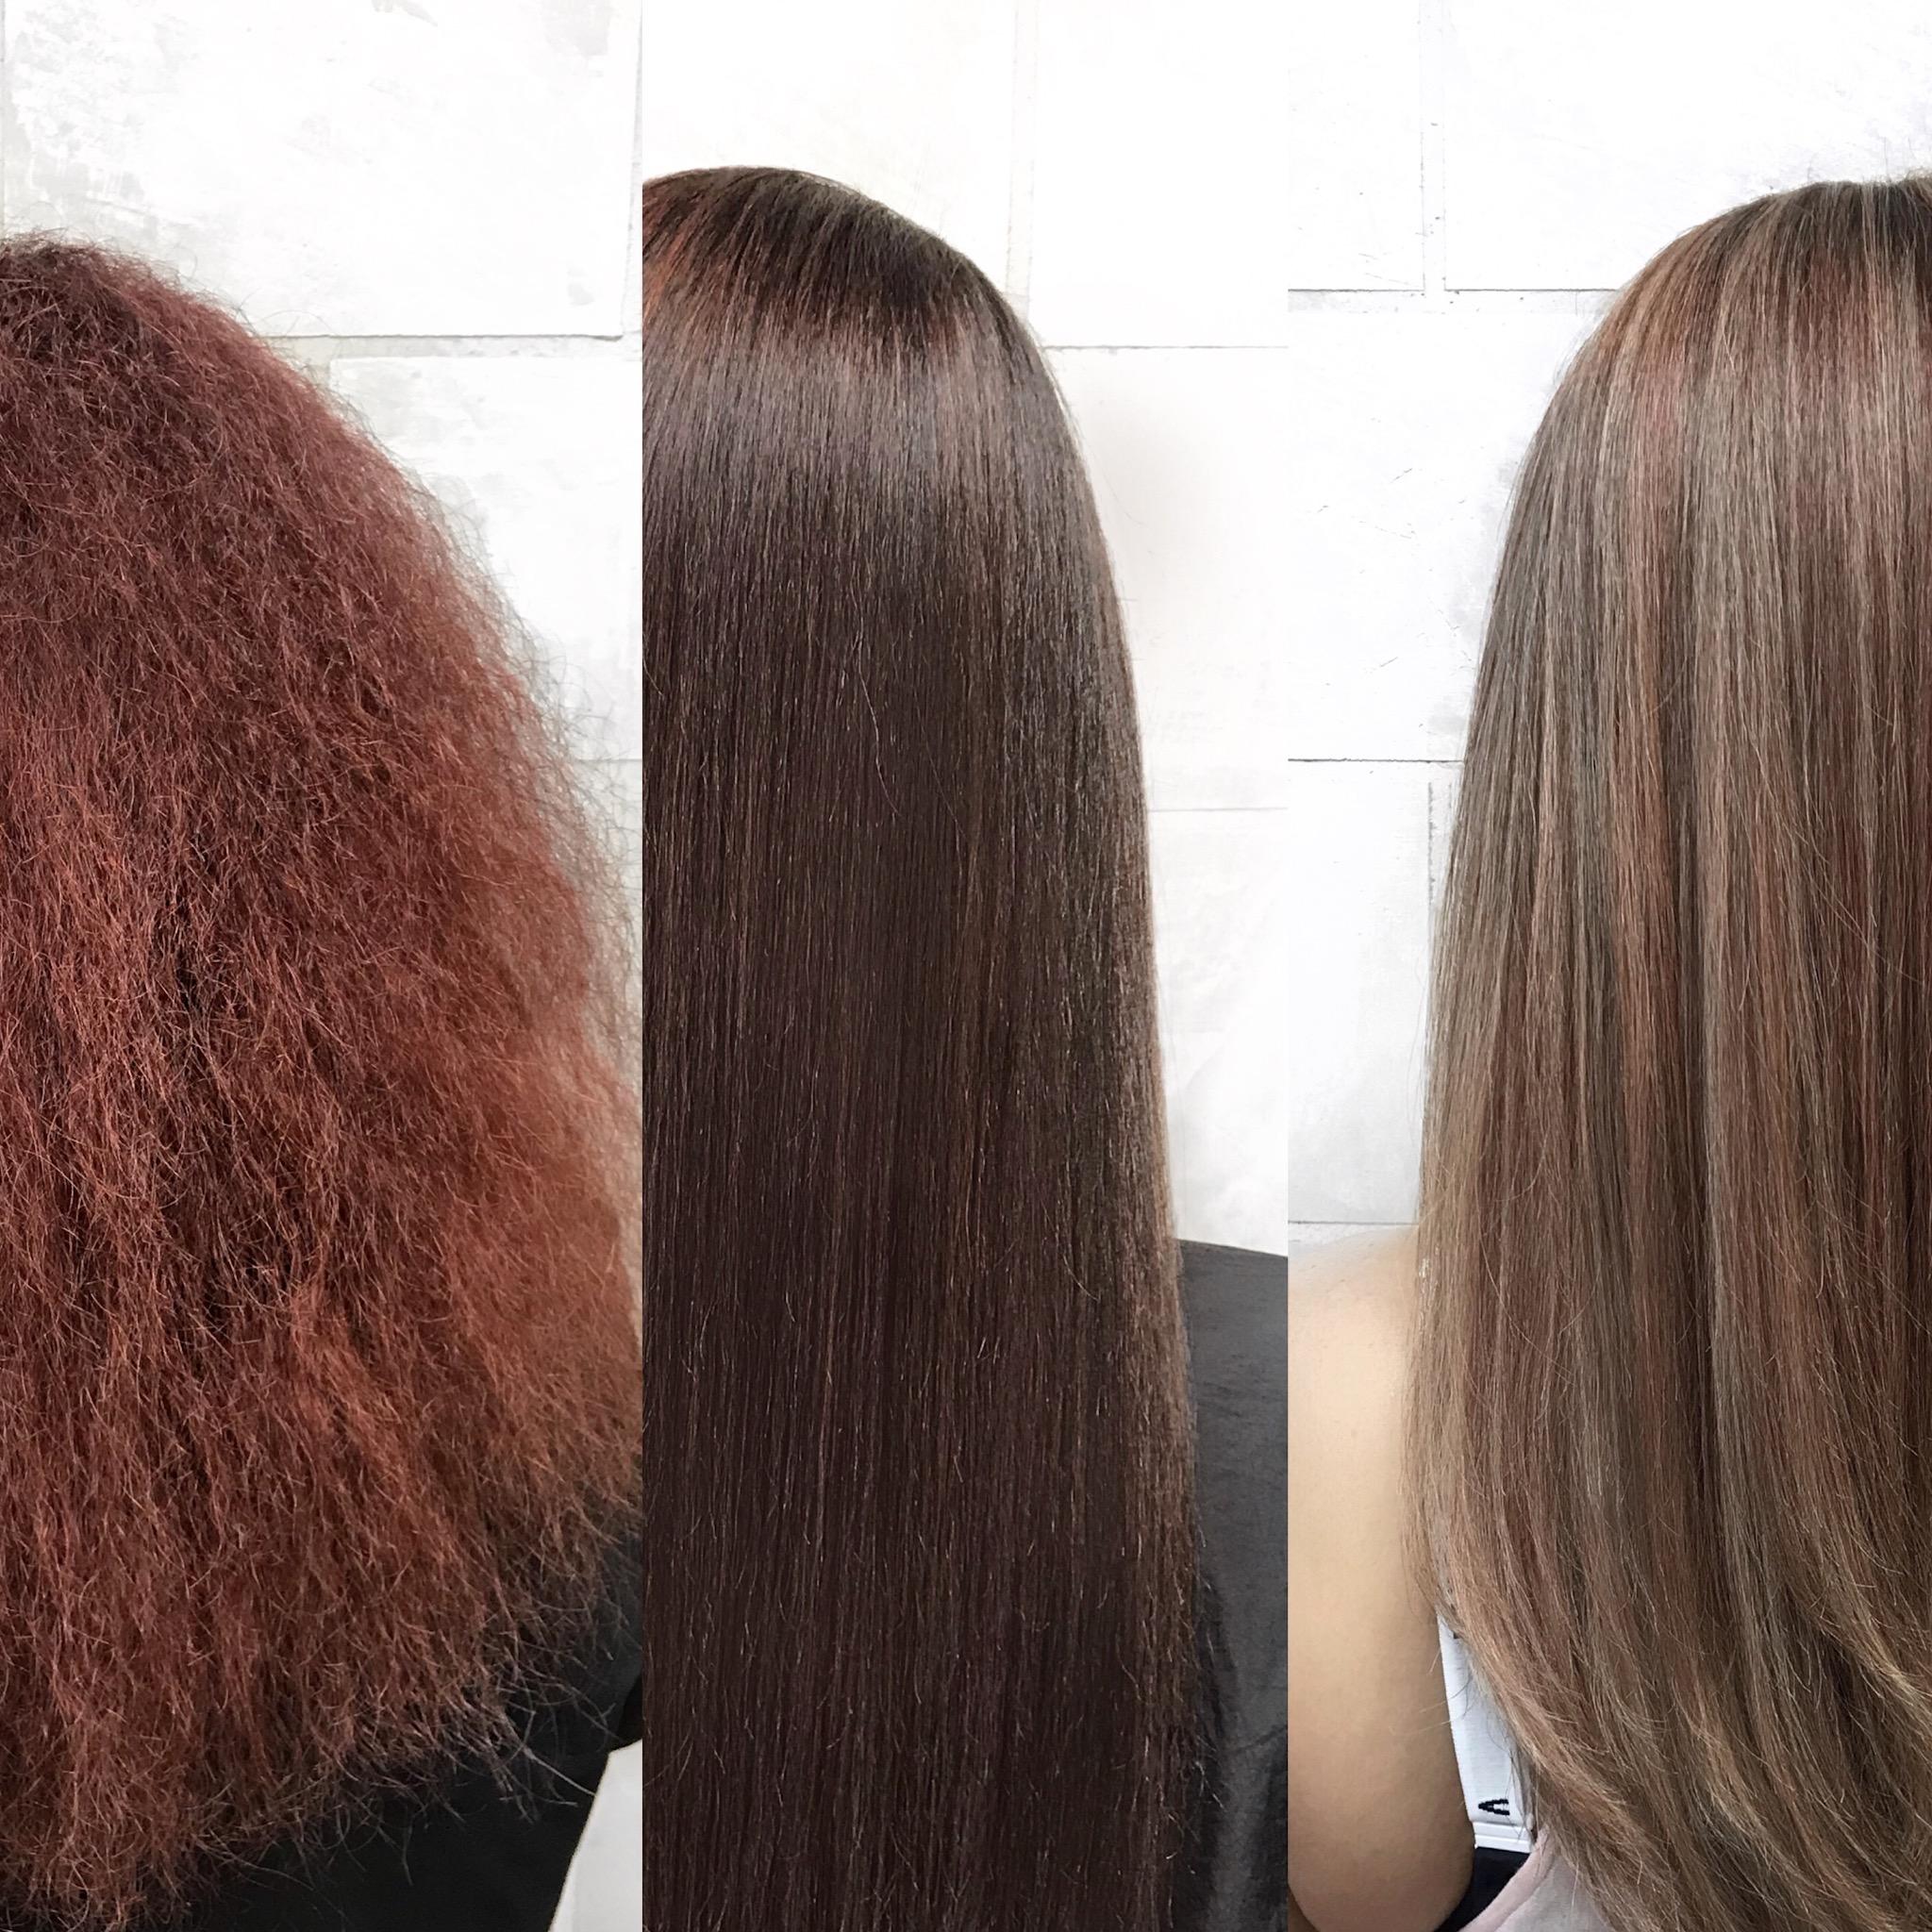 Sarah Dam Chambers Hair Stylist, 90 degrees salon, ballantyne hair stylist, ballantyne hair salon, Marvin hair stylist, Marvin Hair salon